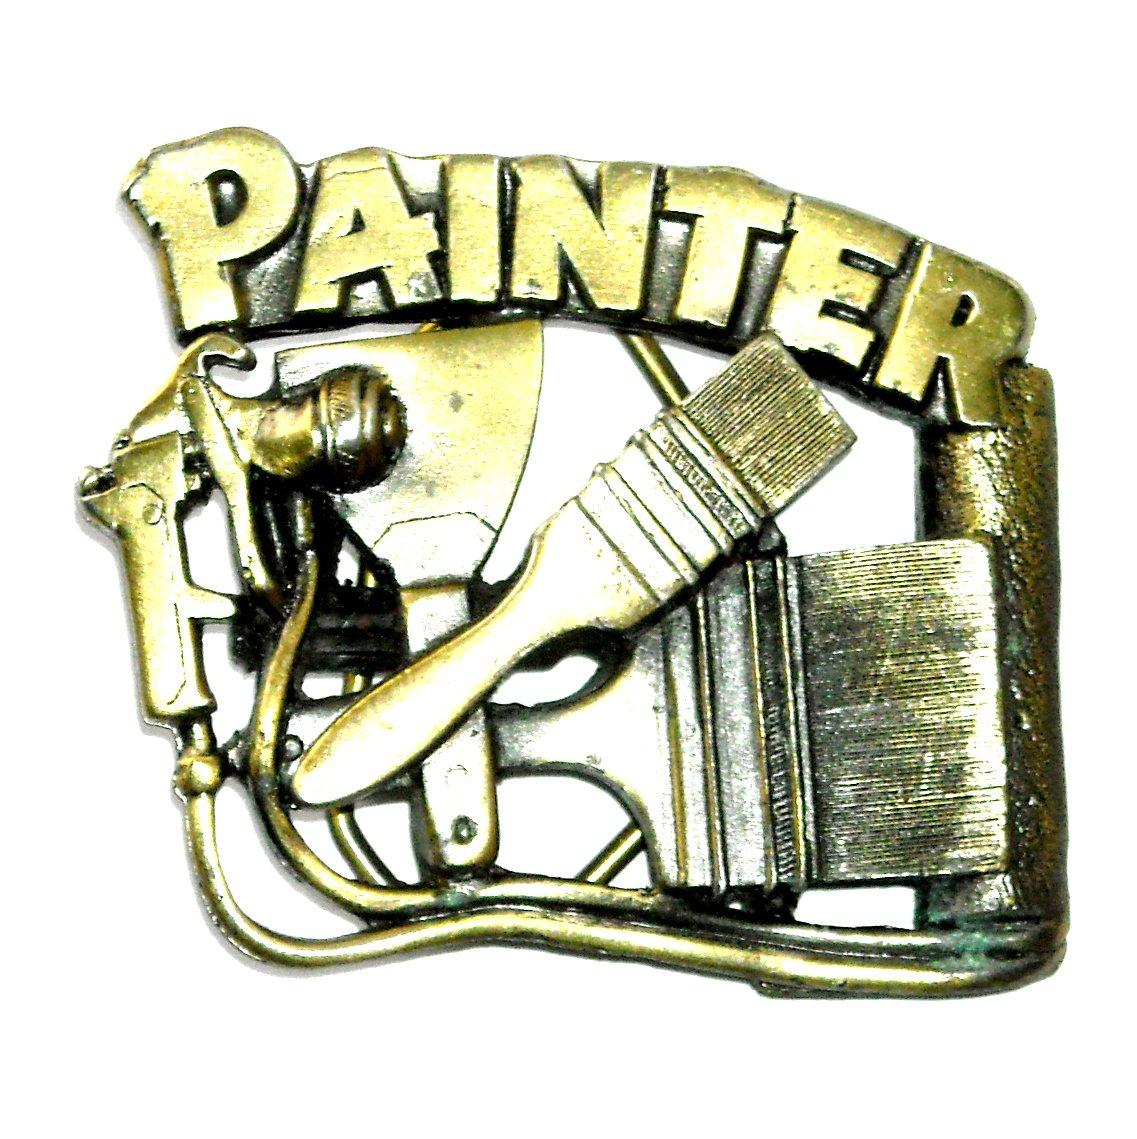 Painter 3D Brass Color 1992 Great American Belt Buckle